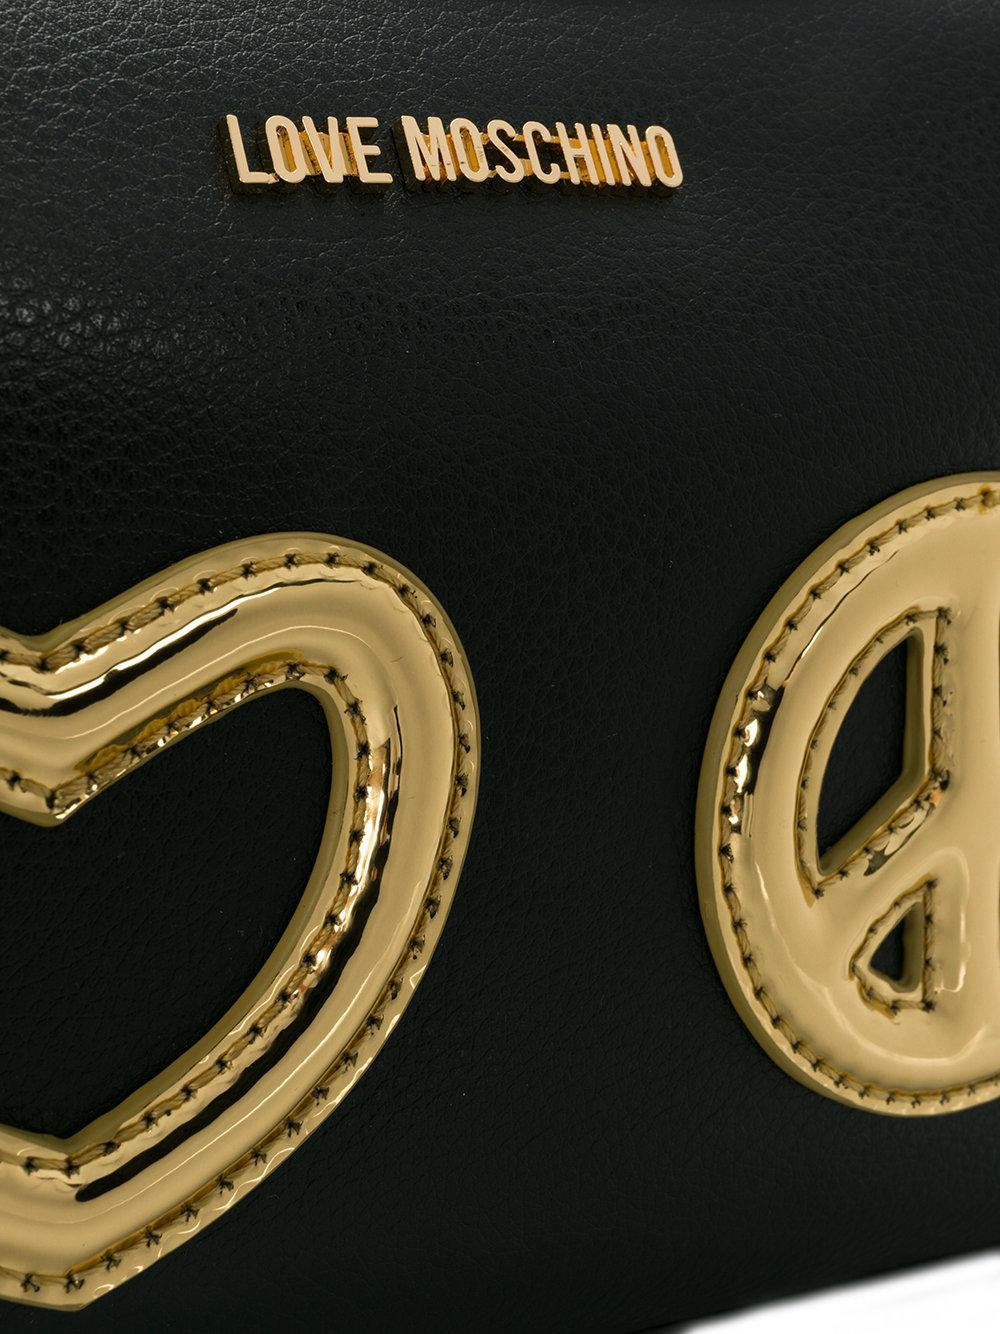 Love Moschino Leather Appliqué Hearts Crossbody Bag in Black